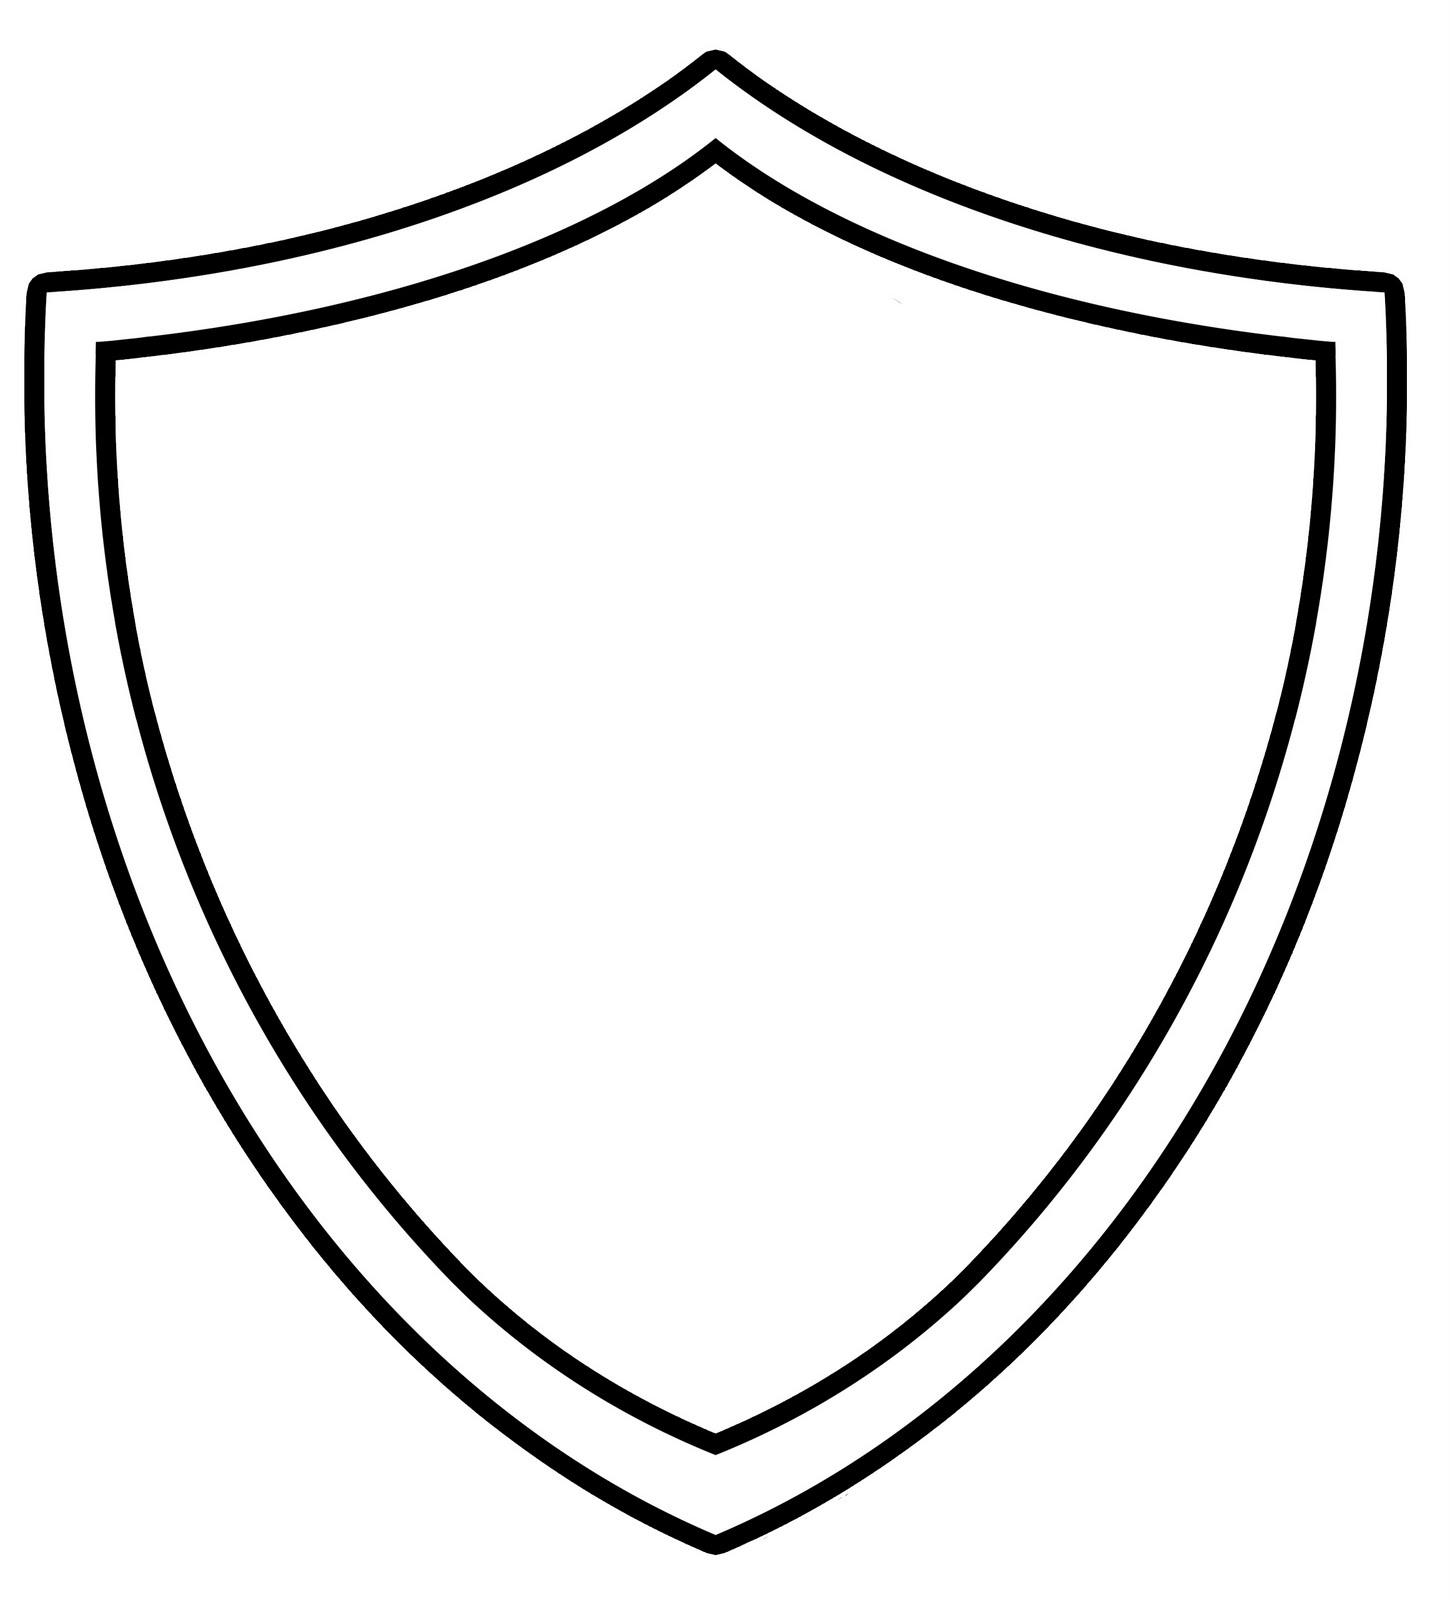 Free Shields, Download Free Clip Art, Free Clip Art on.